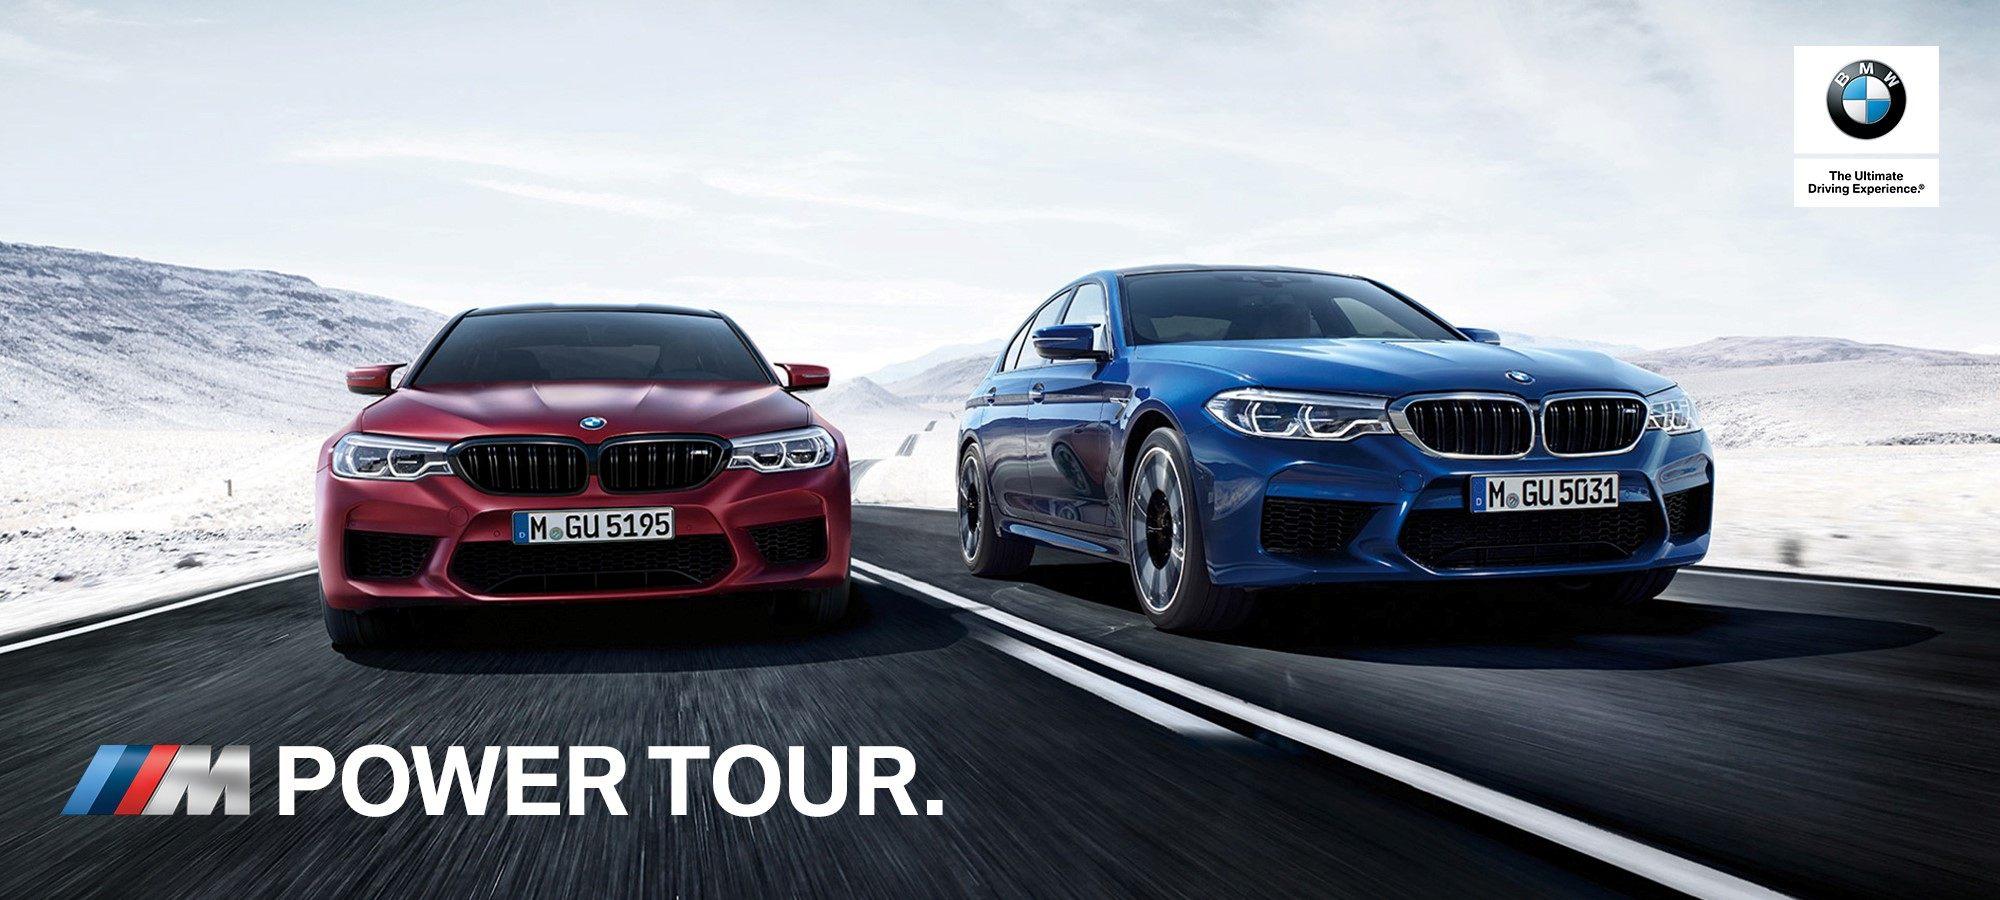 BMW M Power Tour